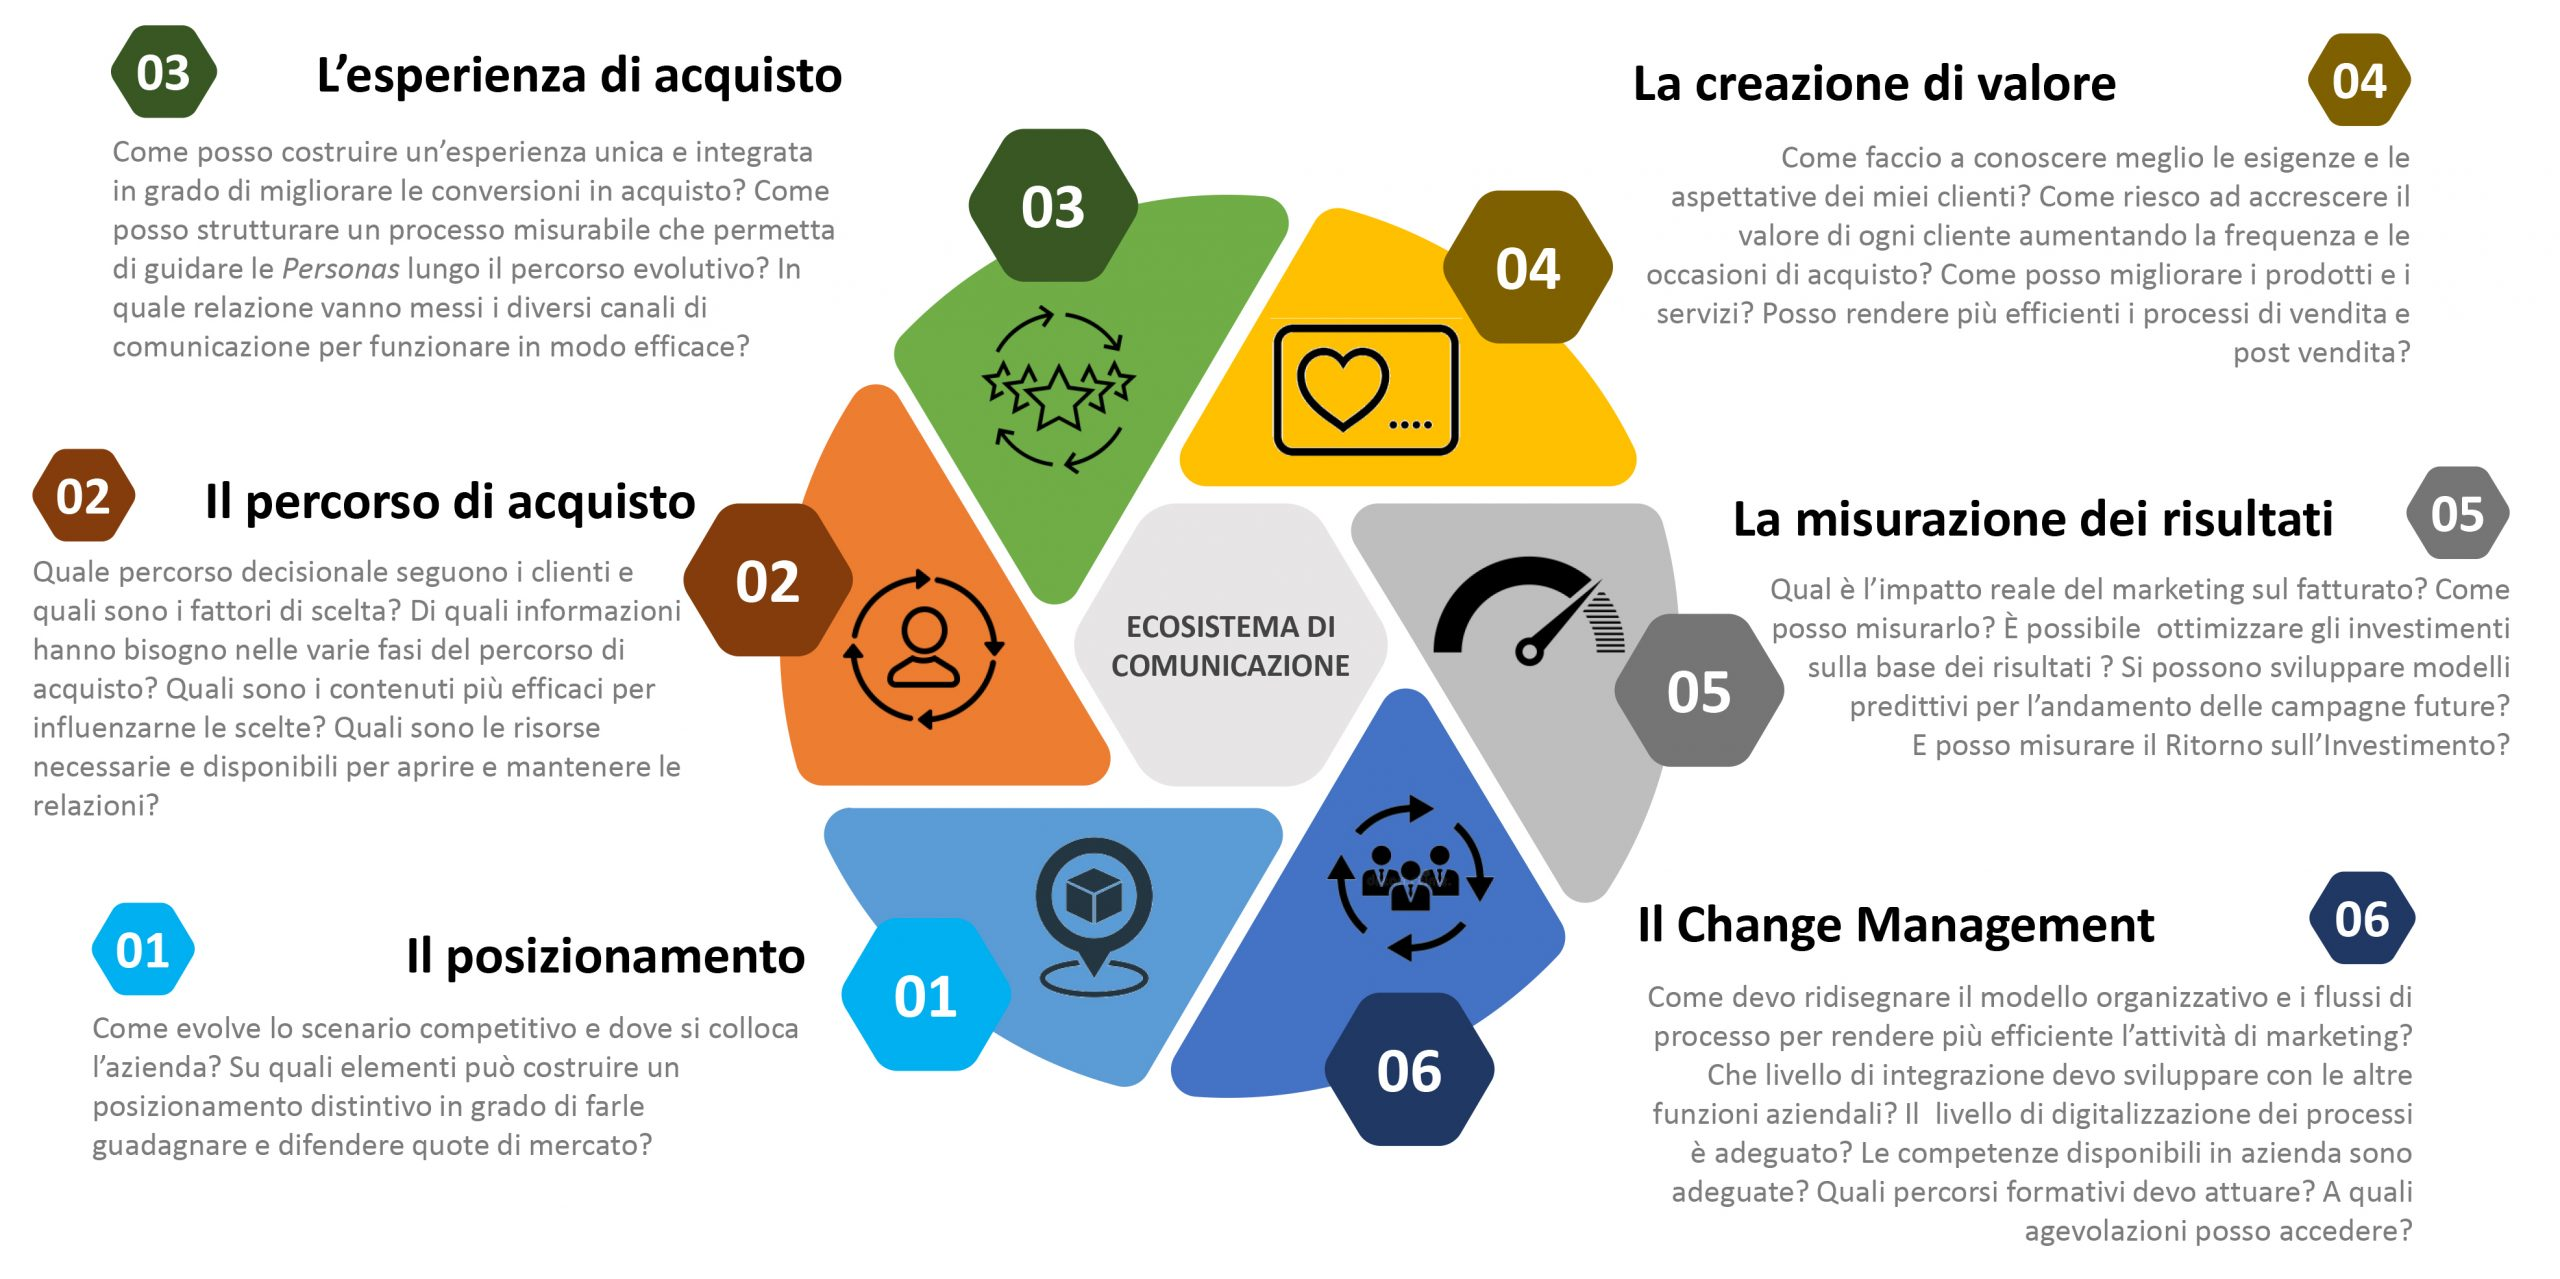 Alessandro Santambrogio, Liquid, ecosistema di comunicazione, roivolution, digital marketing, digital transformation